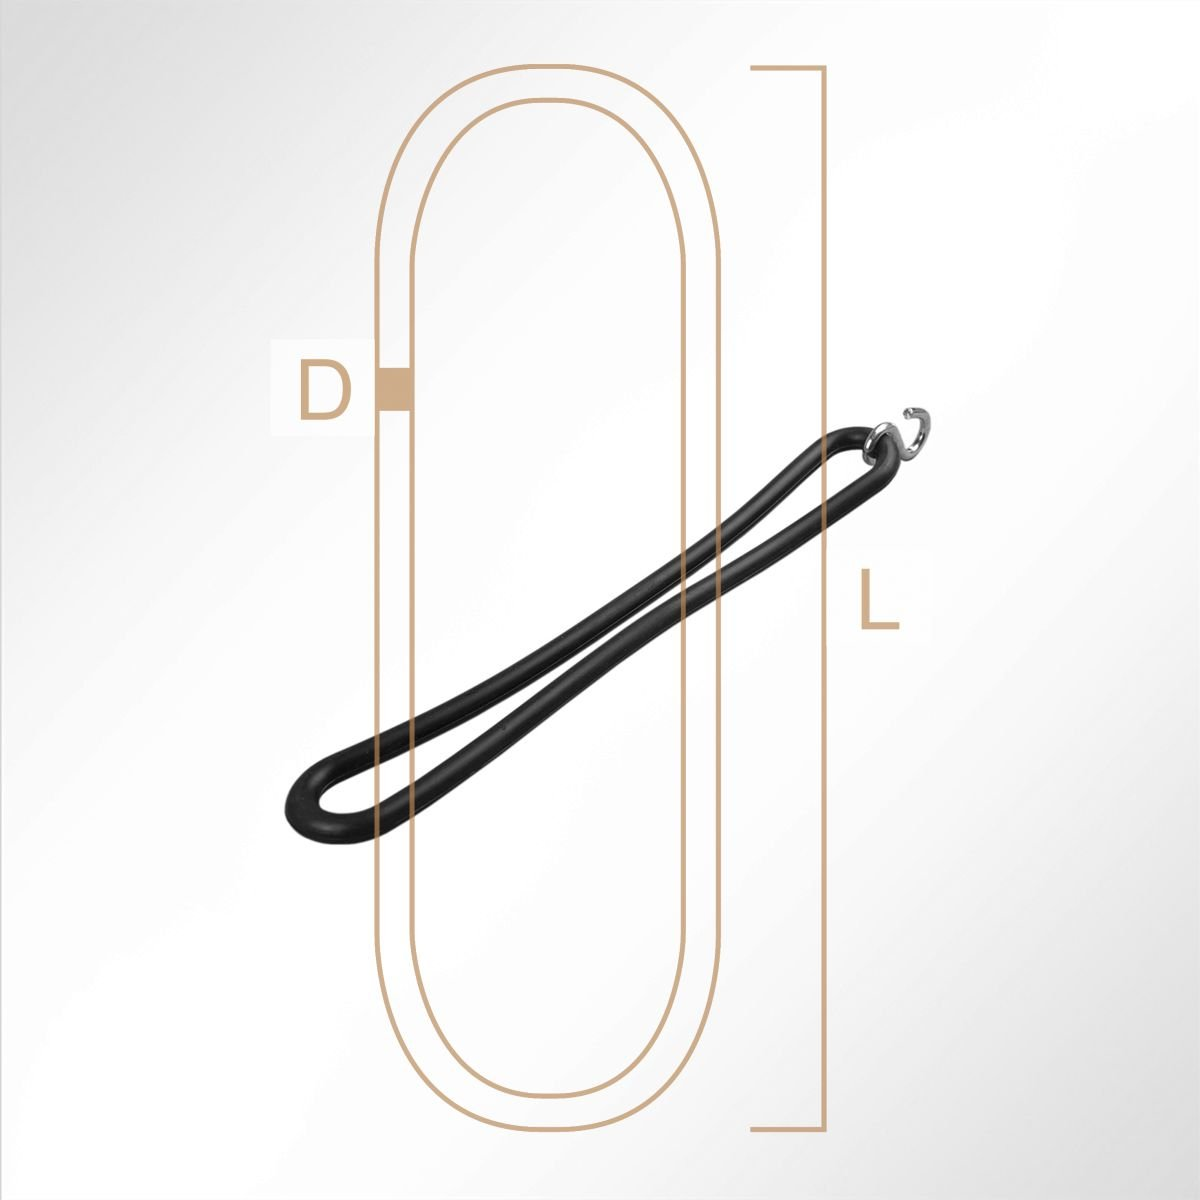 LYSEL/® Gummispannringe EPDM 200mm Gummi Spannring Anh/änger Plane Spanngummi schwarz 1 St/ück